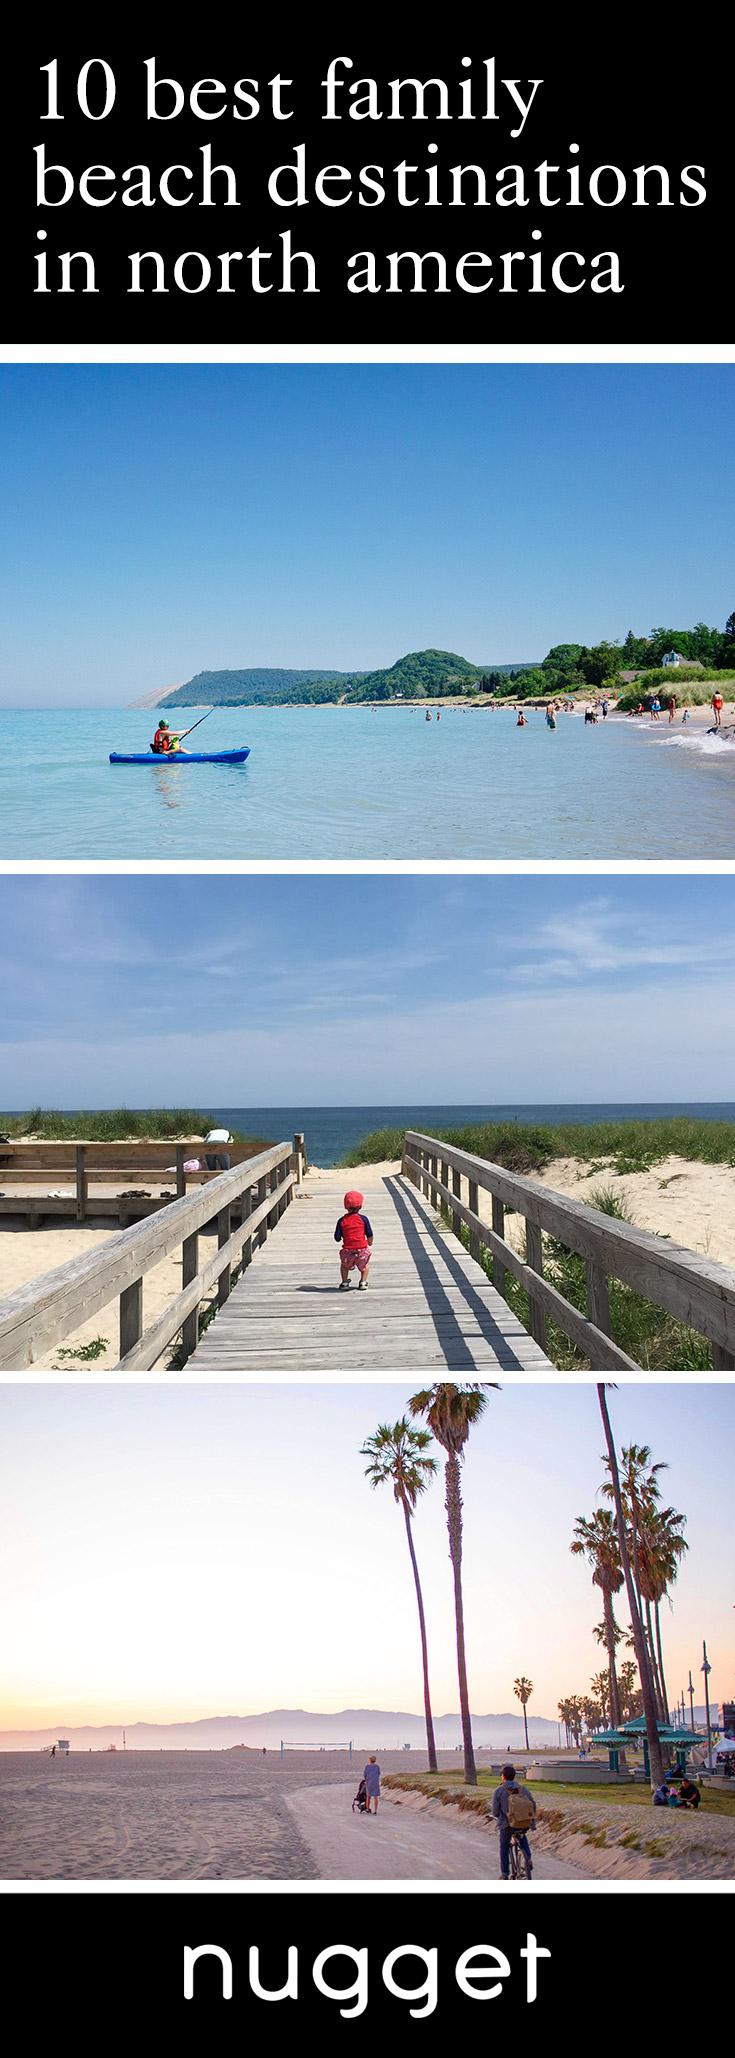 10 Best Family Beach Destinations in North America